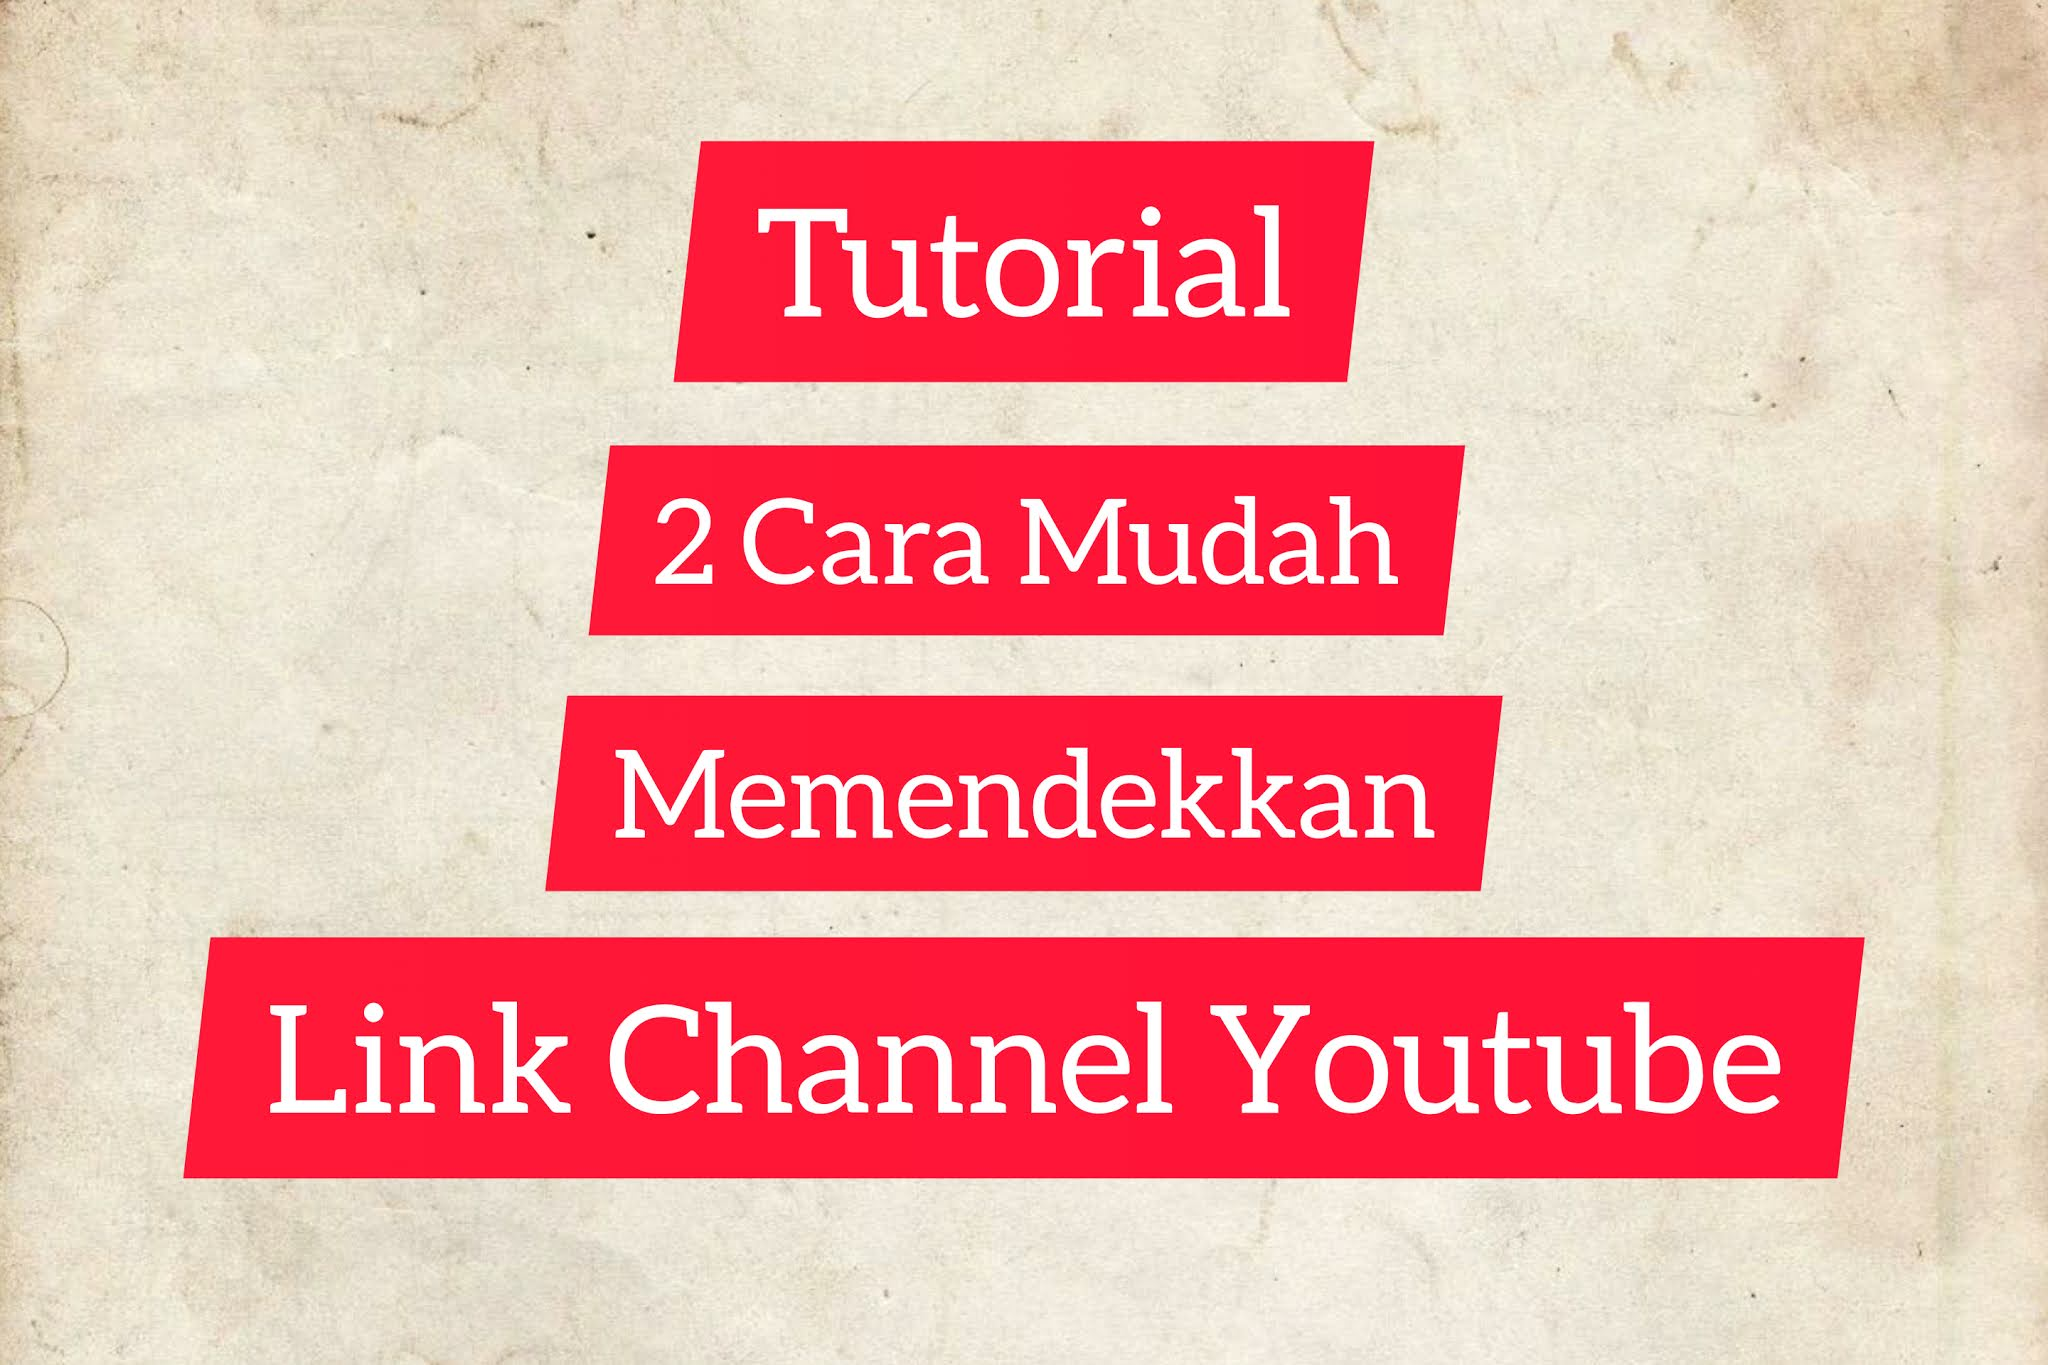 Cara memendekkan link chanel youtube